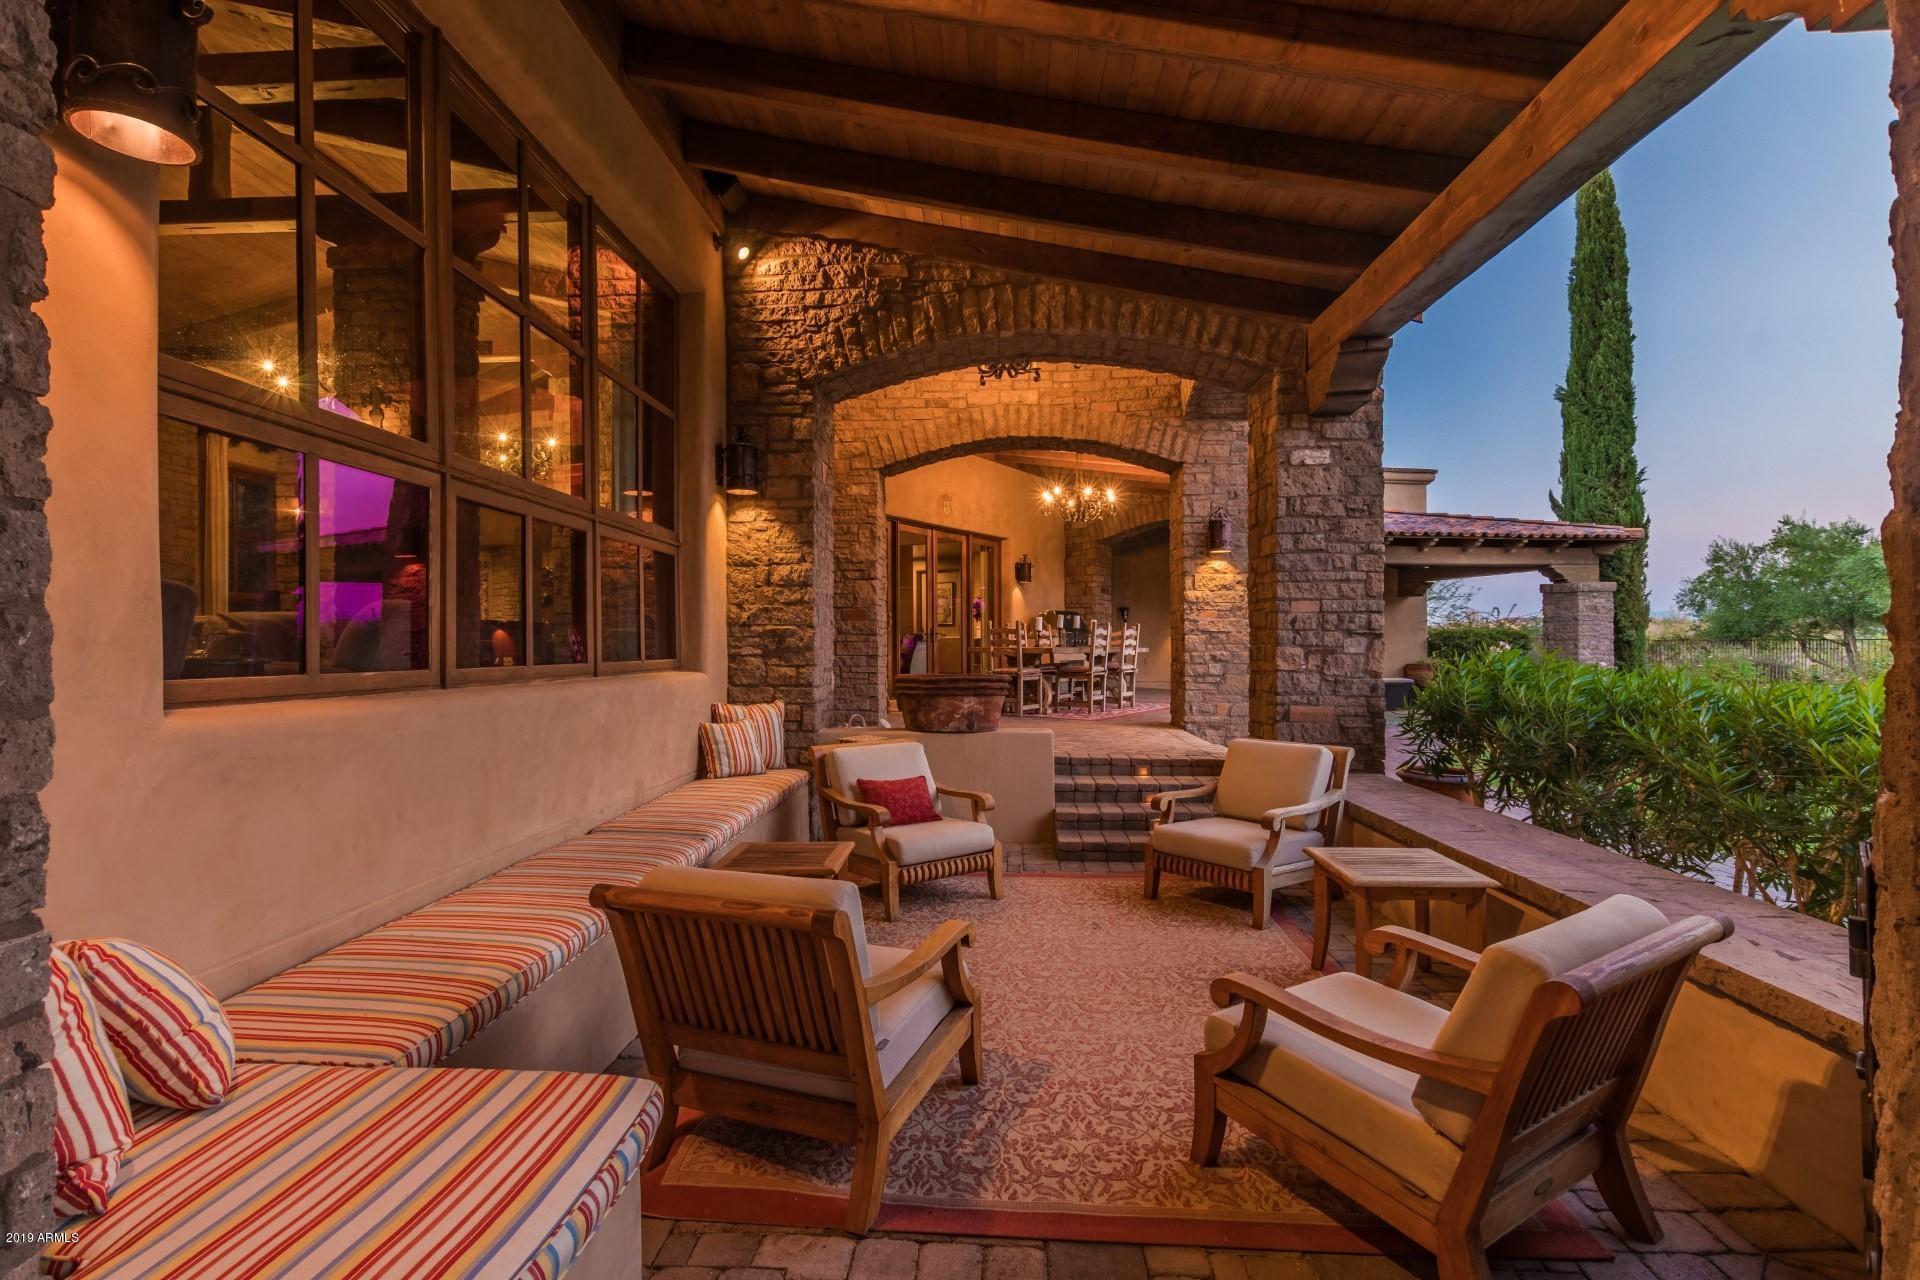 26125 N 116th St Scottsdale, AZ